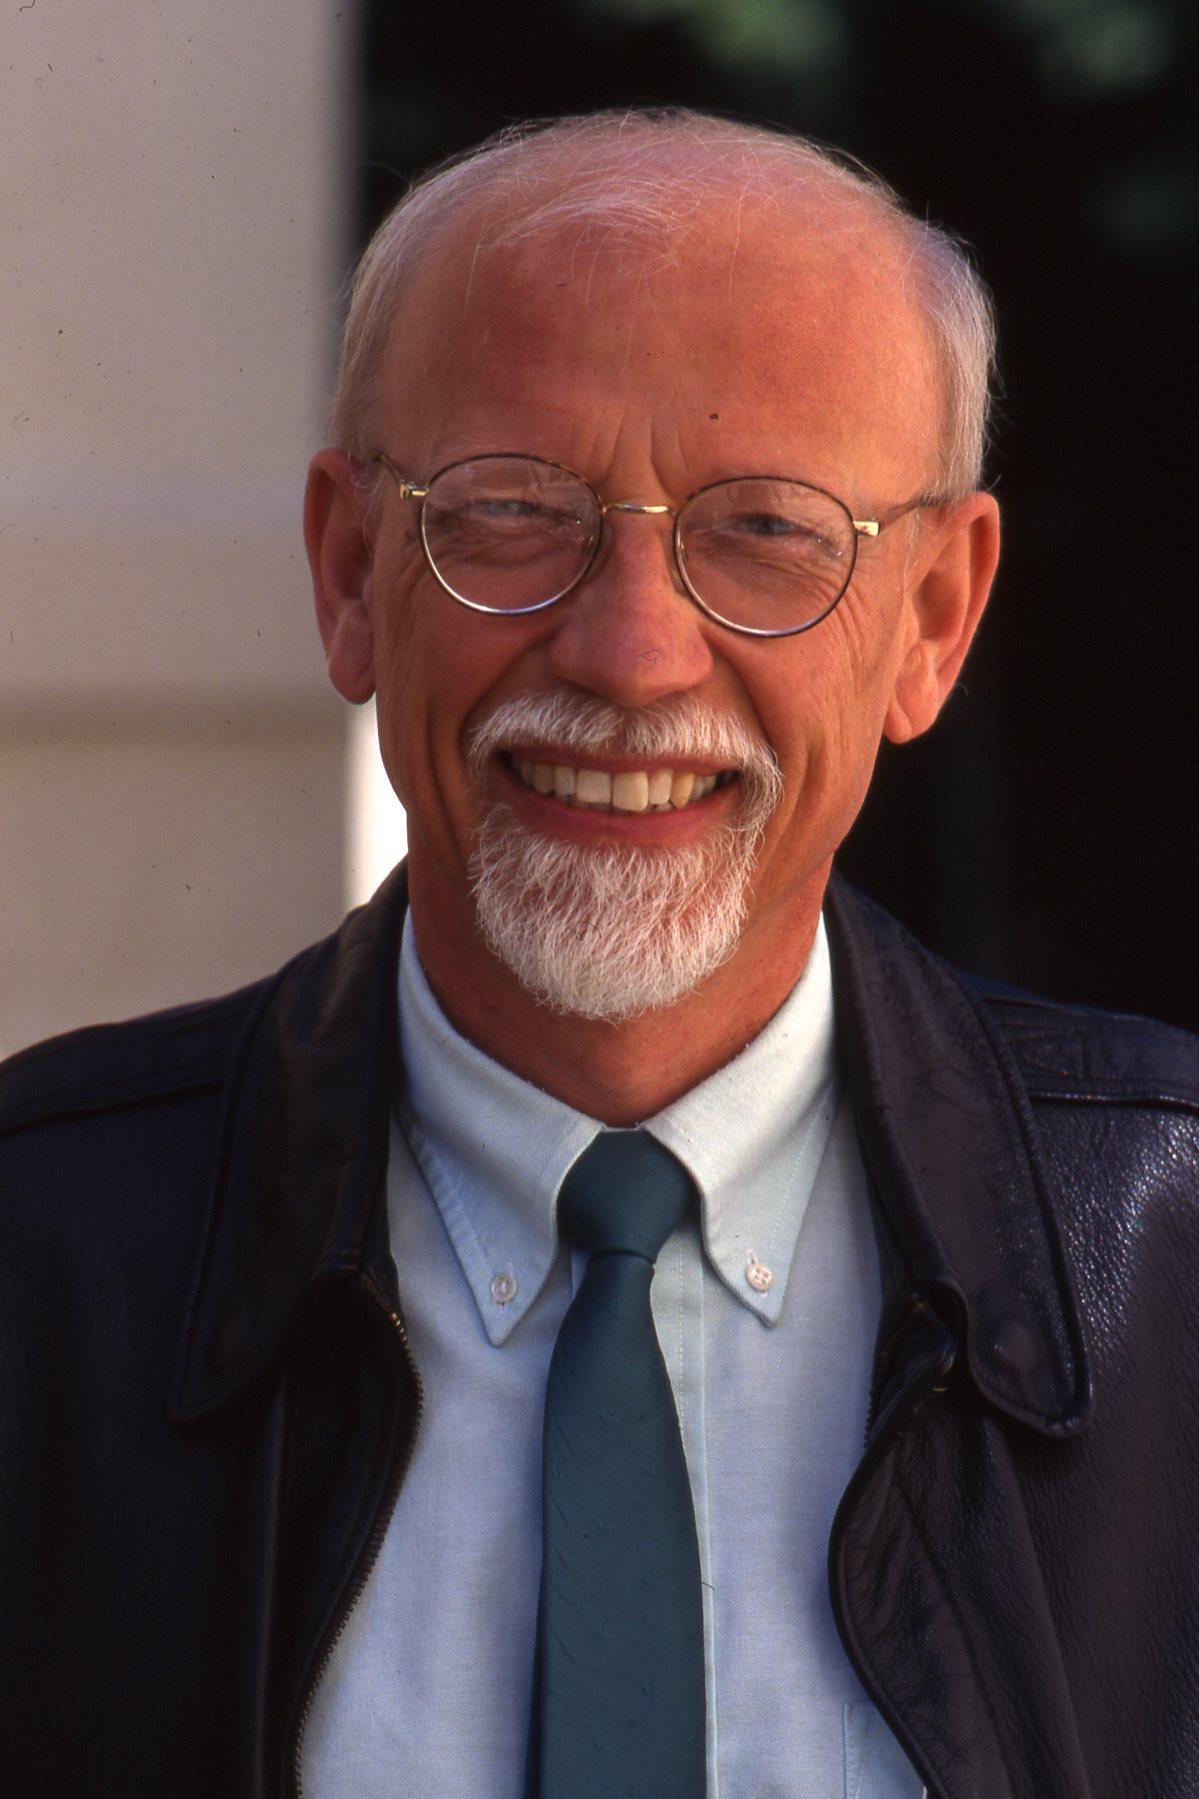 Profile on Professor Cumiford